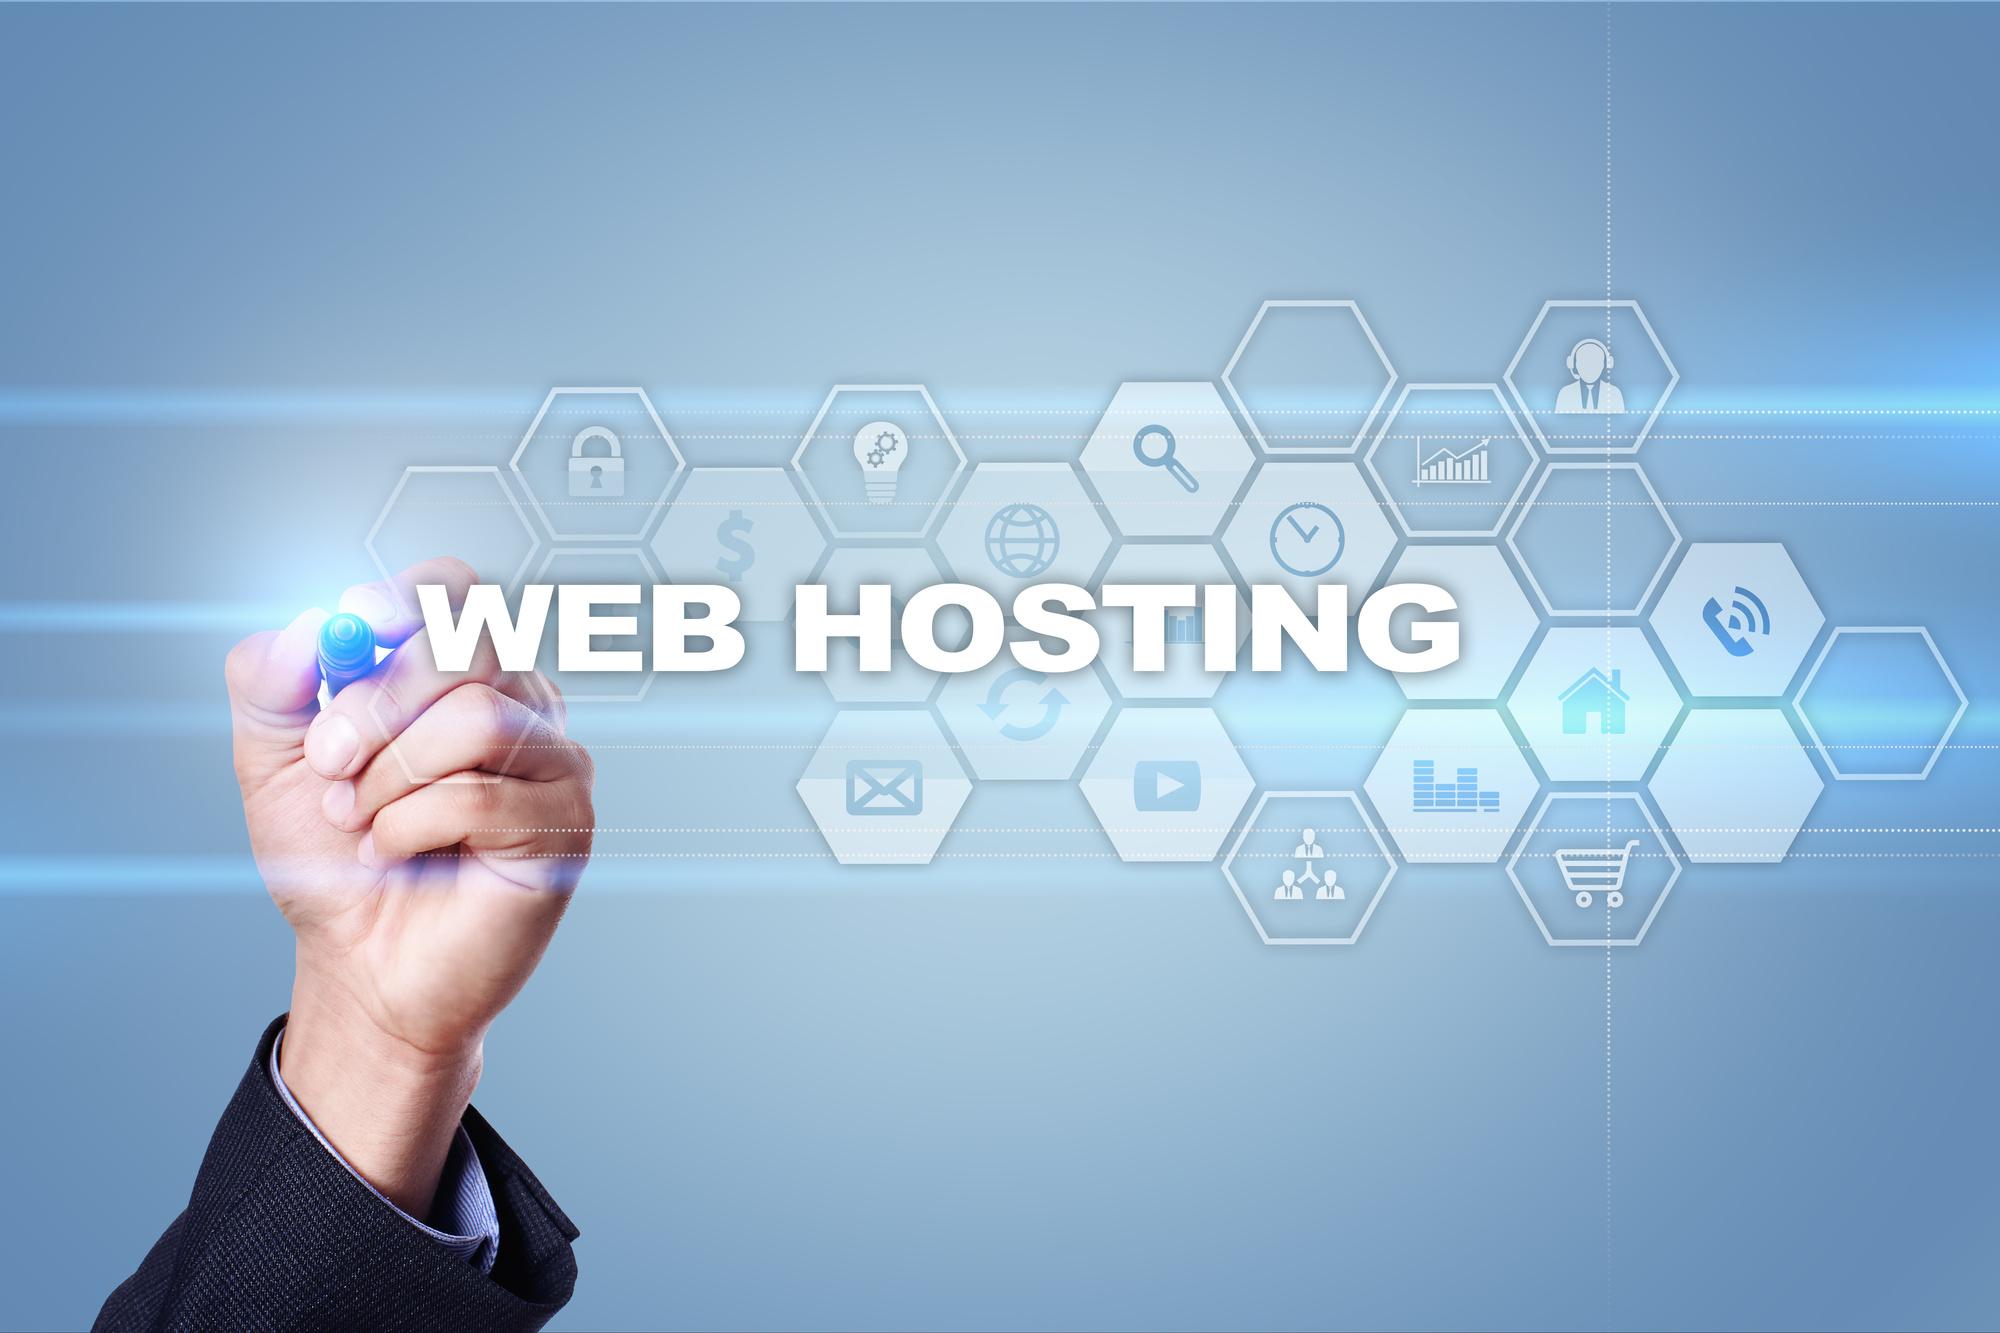 web hosting diagram